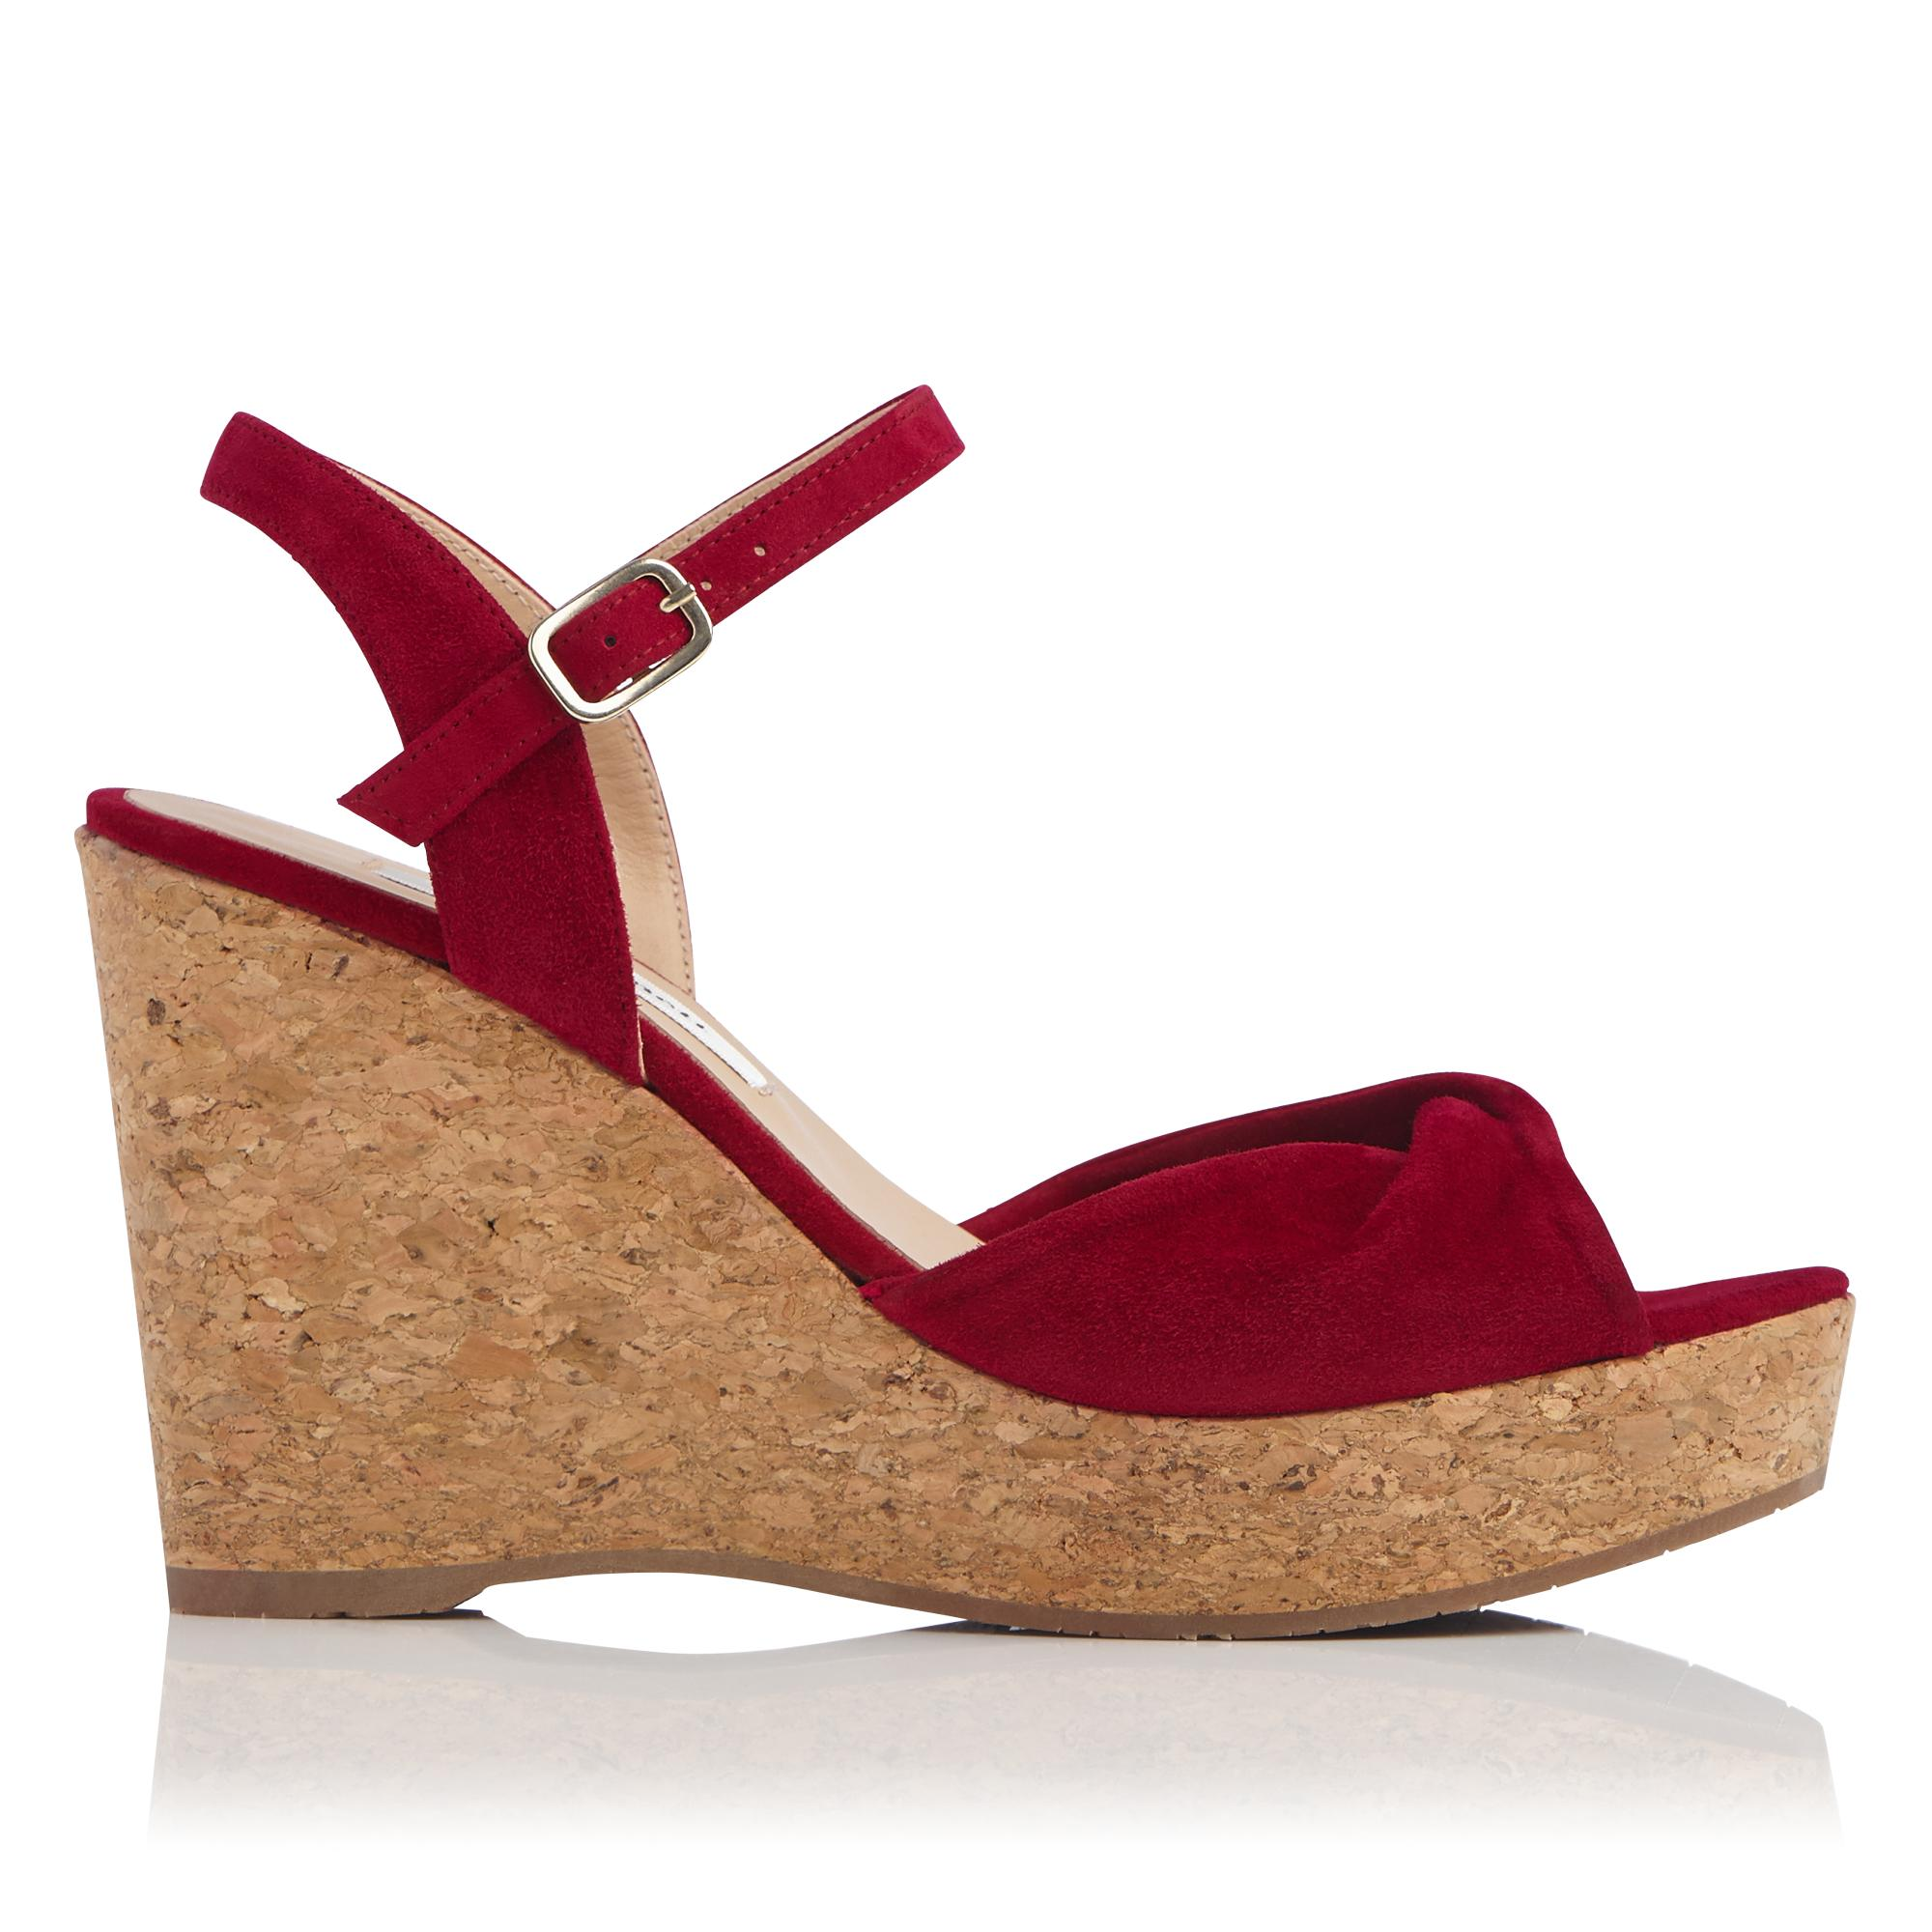 Adeline Poppy Suede Sandals